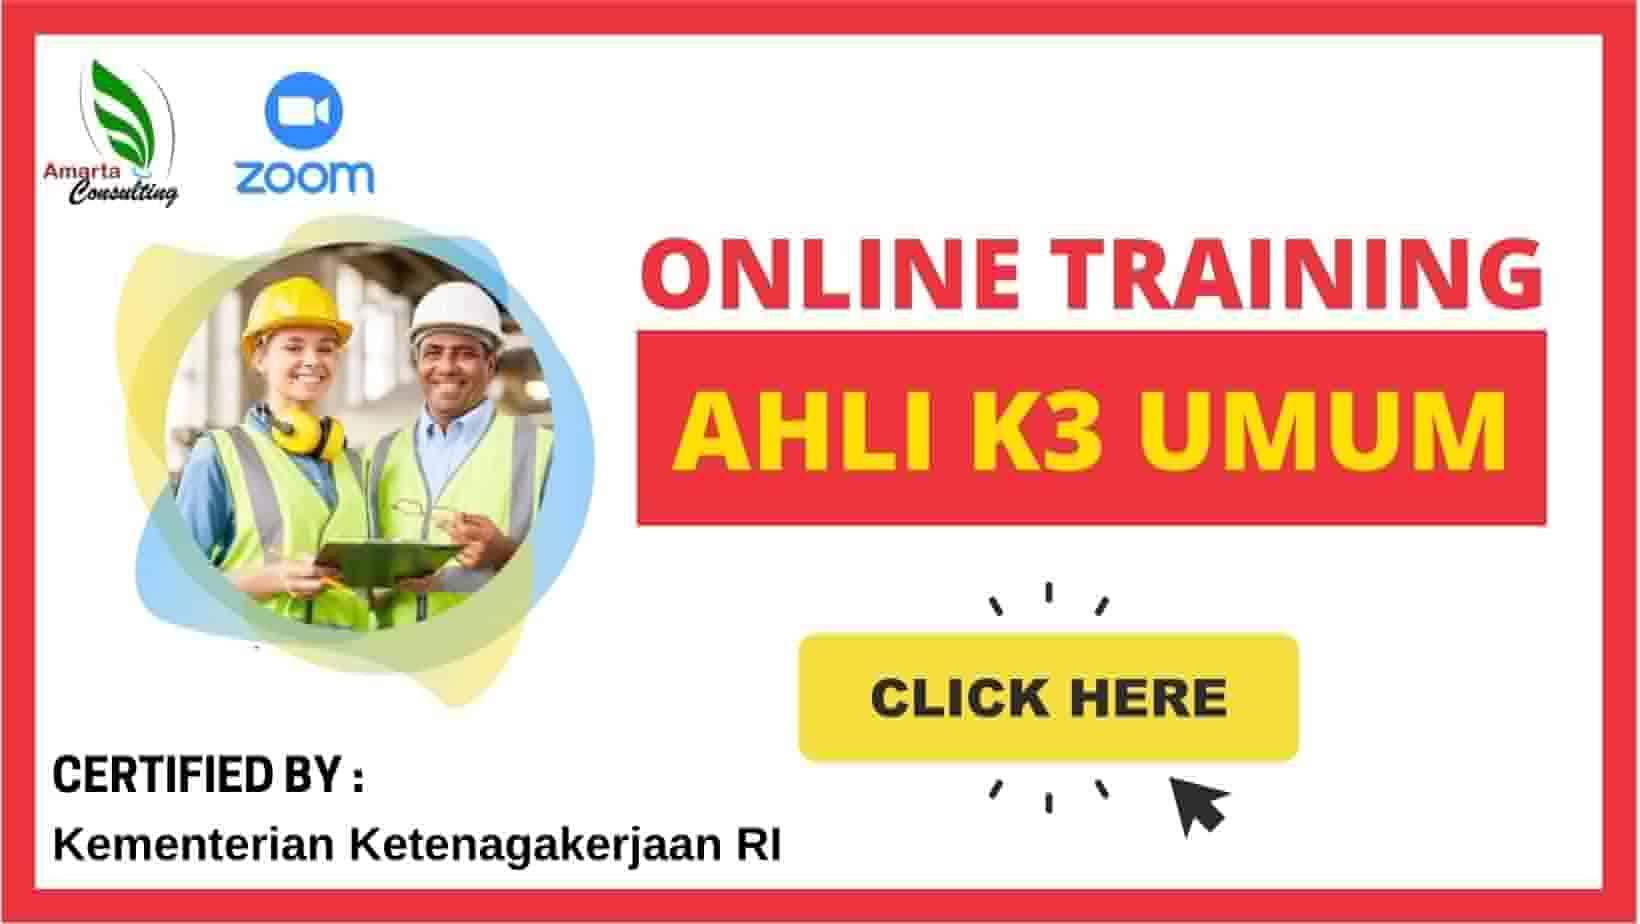 Online Training Ahli K3 Umum